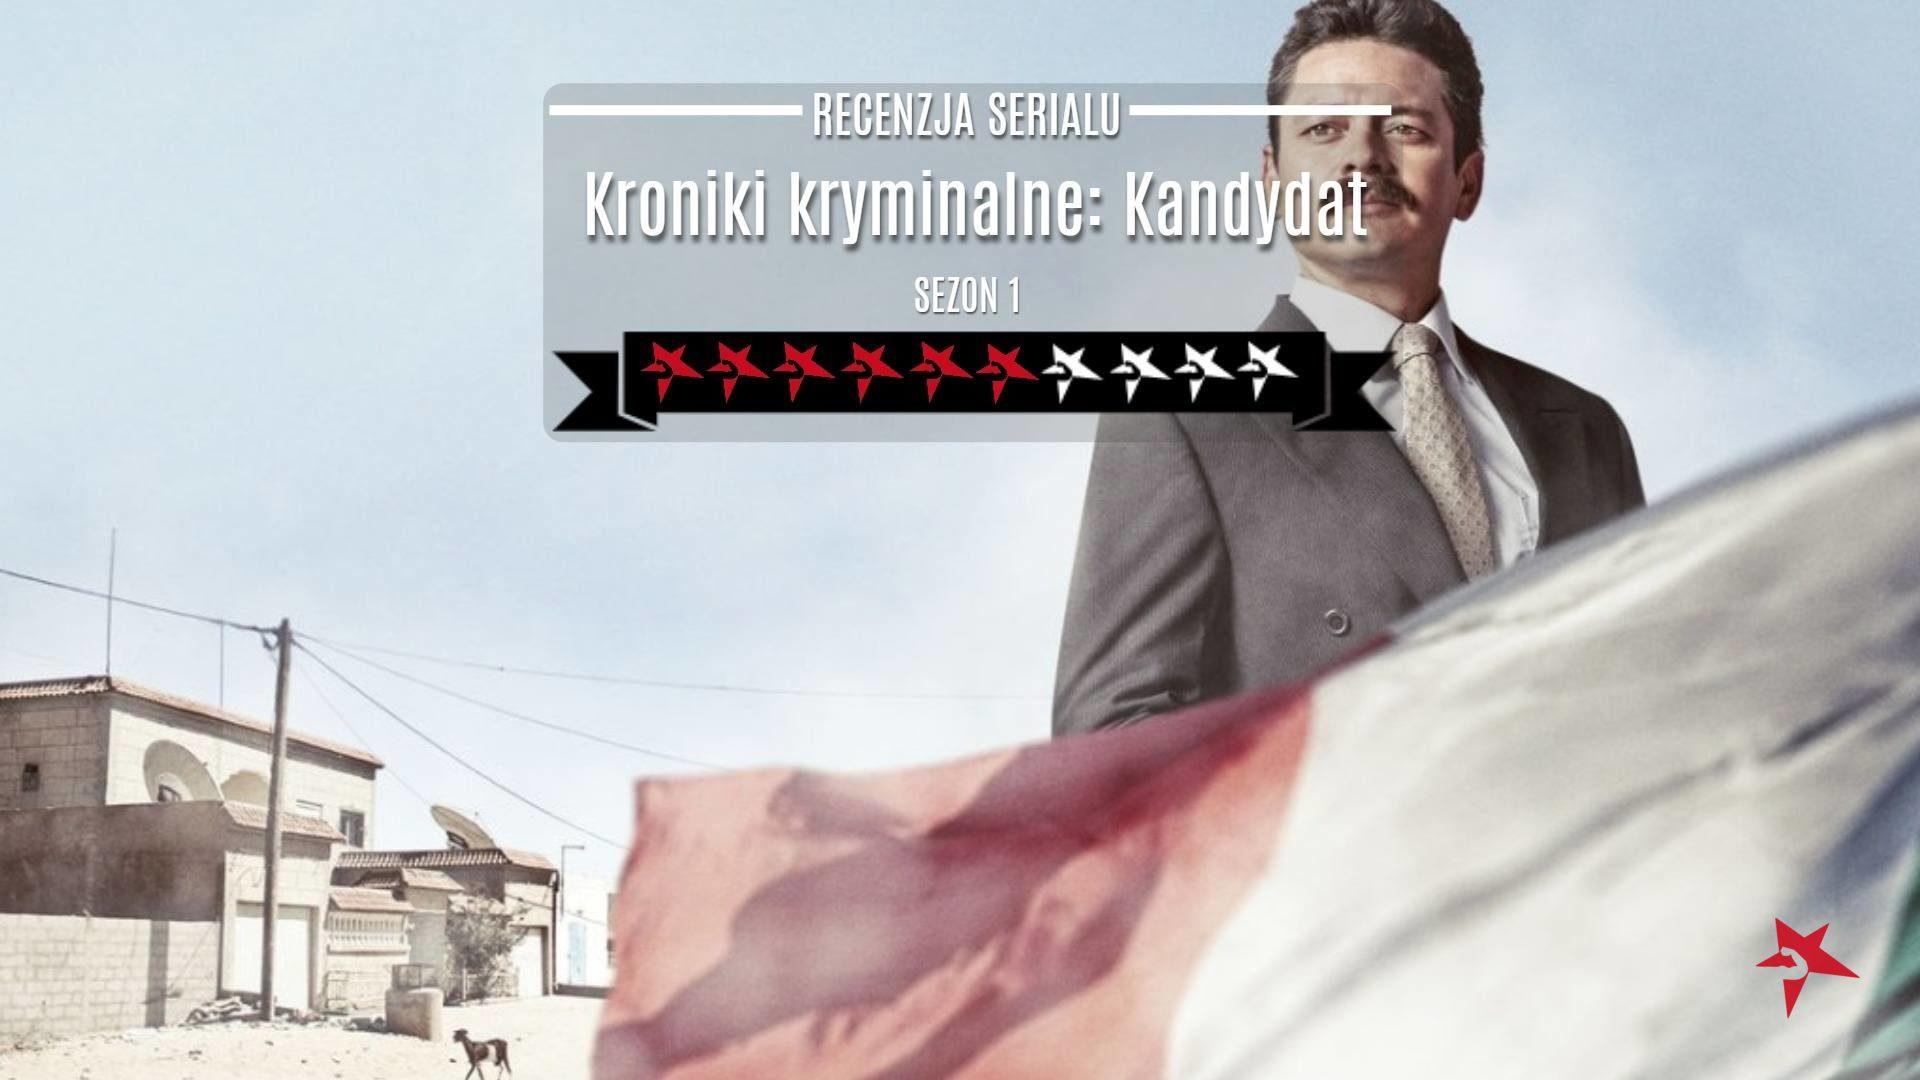 Kroniki kryminalne: Kandydat - recenzja kryminalnego serialu Netflixa